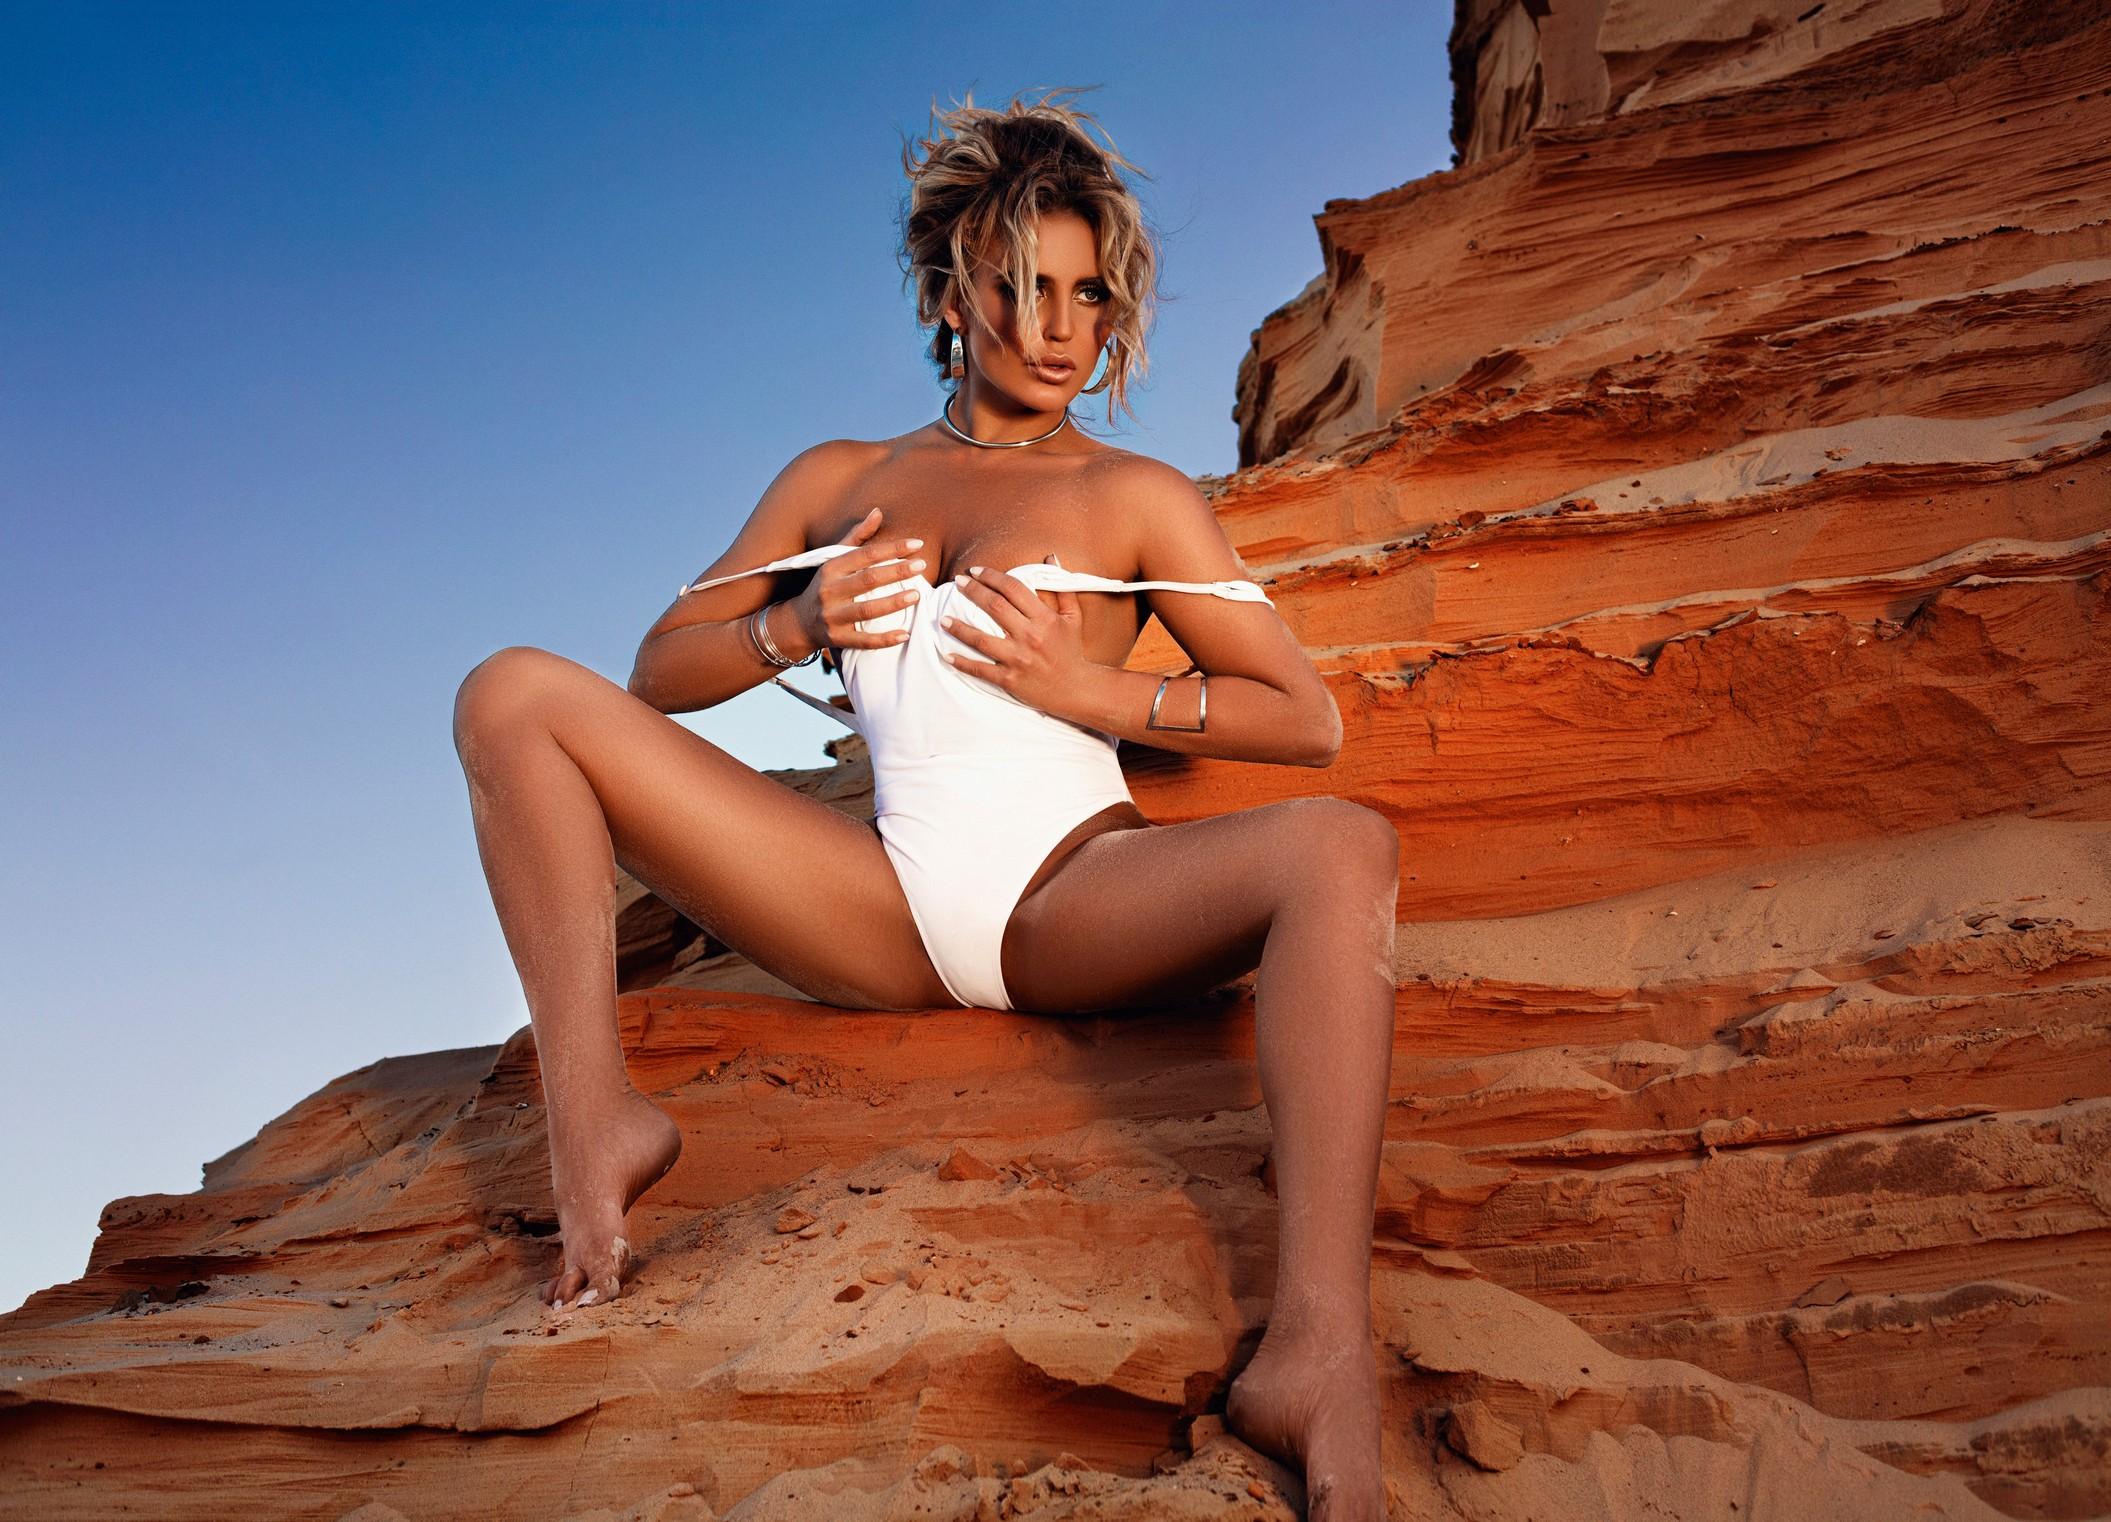 Alina Ilina Breathtaking Nude Pictures, Massive Boobs